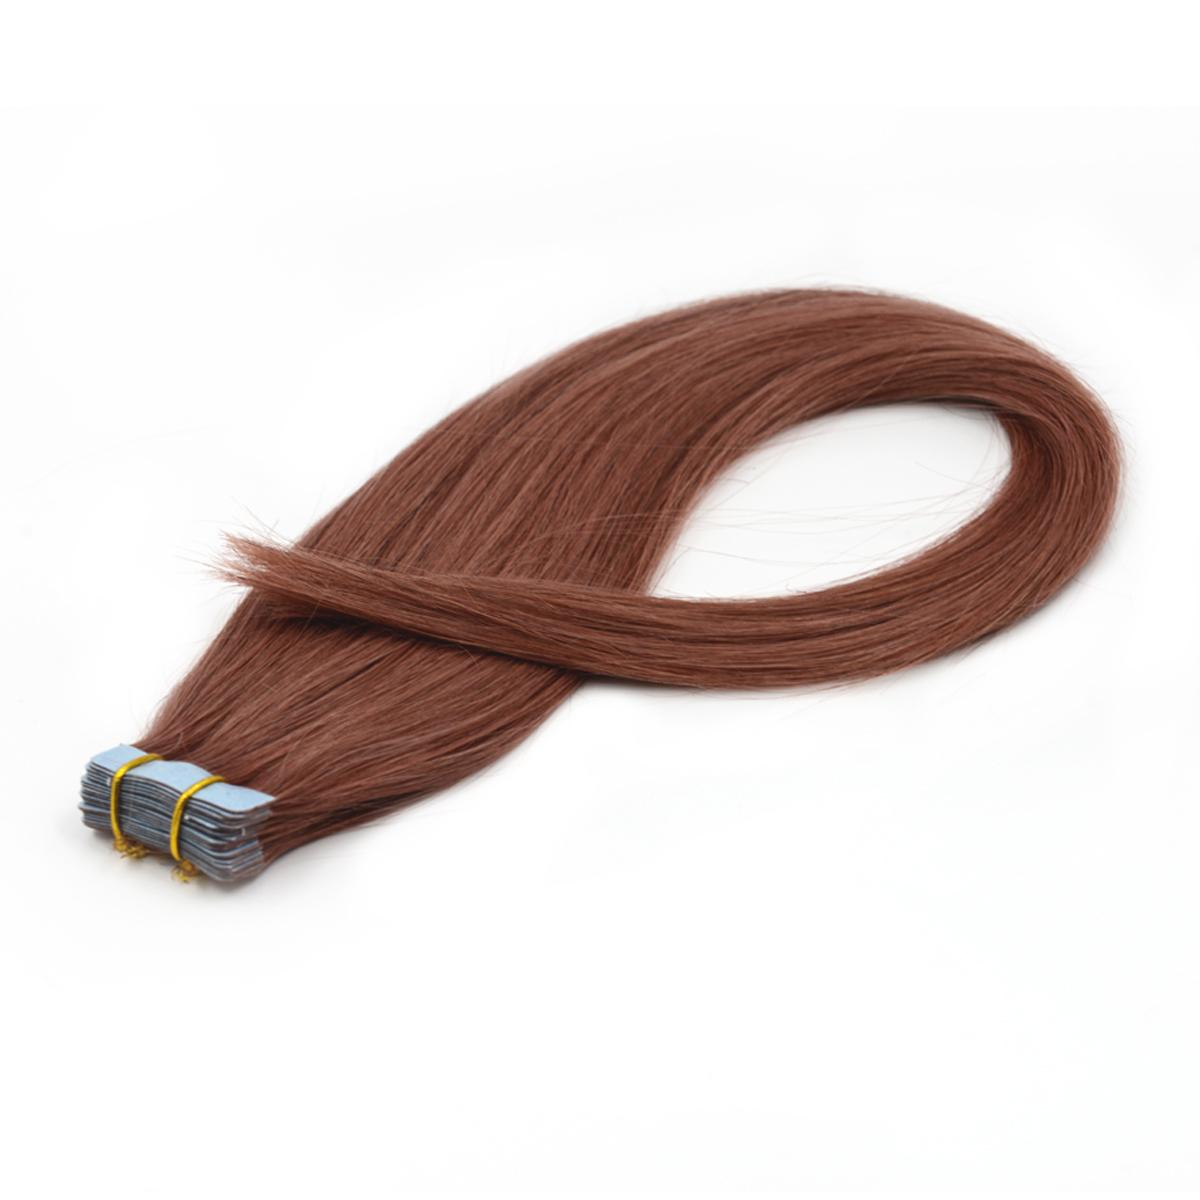 Wholesale Tape Hair Extension Human Virgin Hair Bundles #33